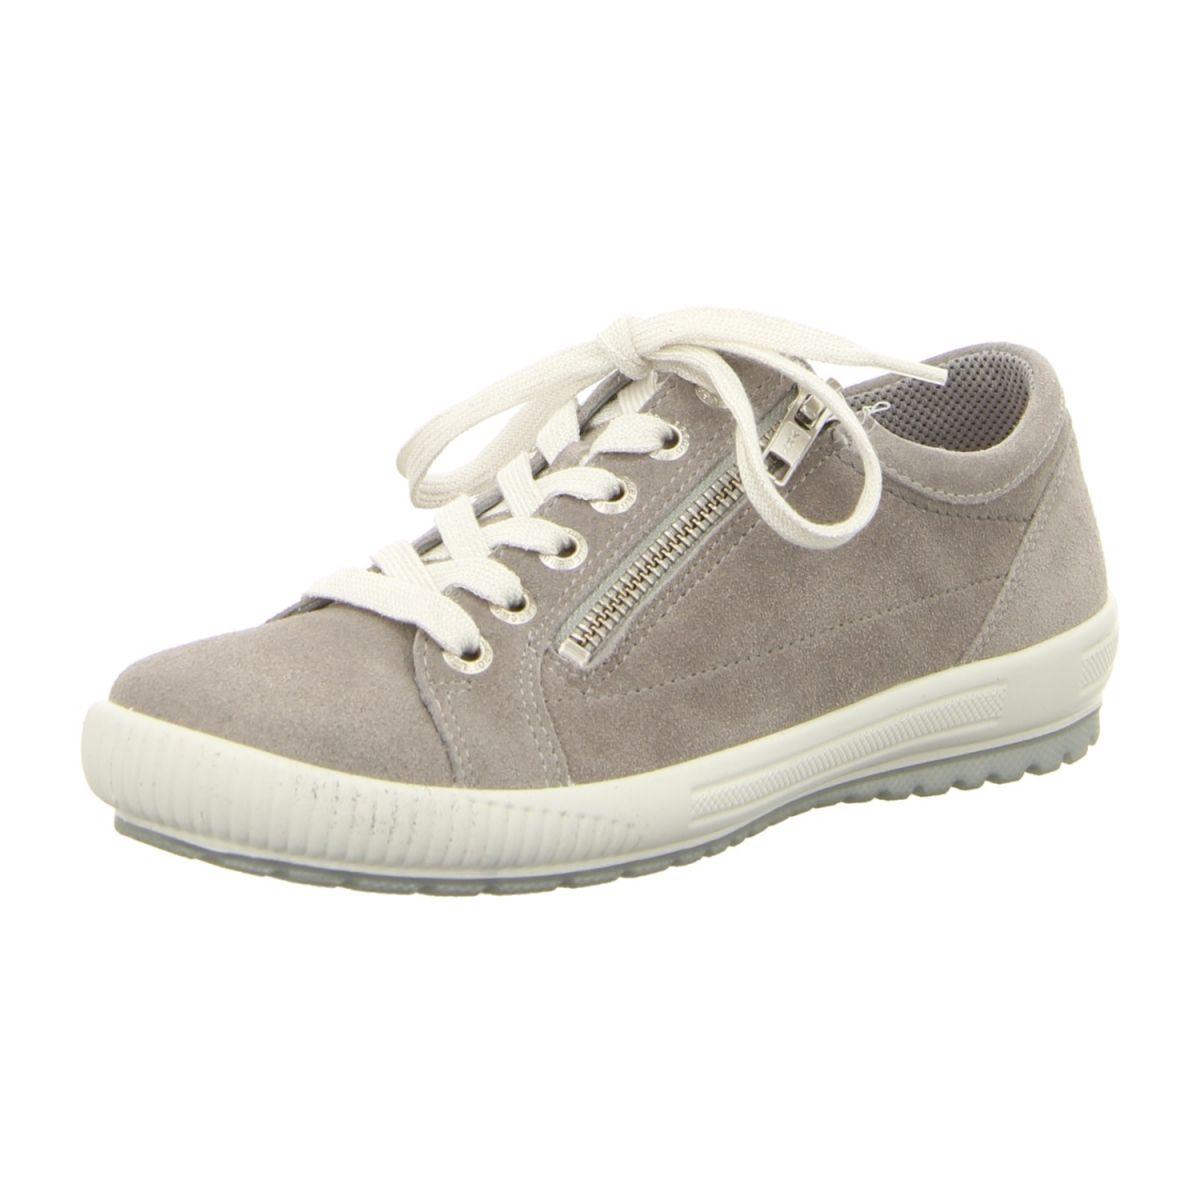 Sneaker Femmes Legero PmVPY26Rvq